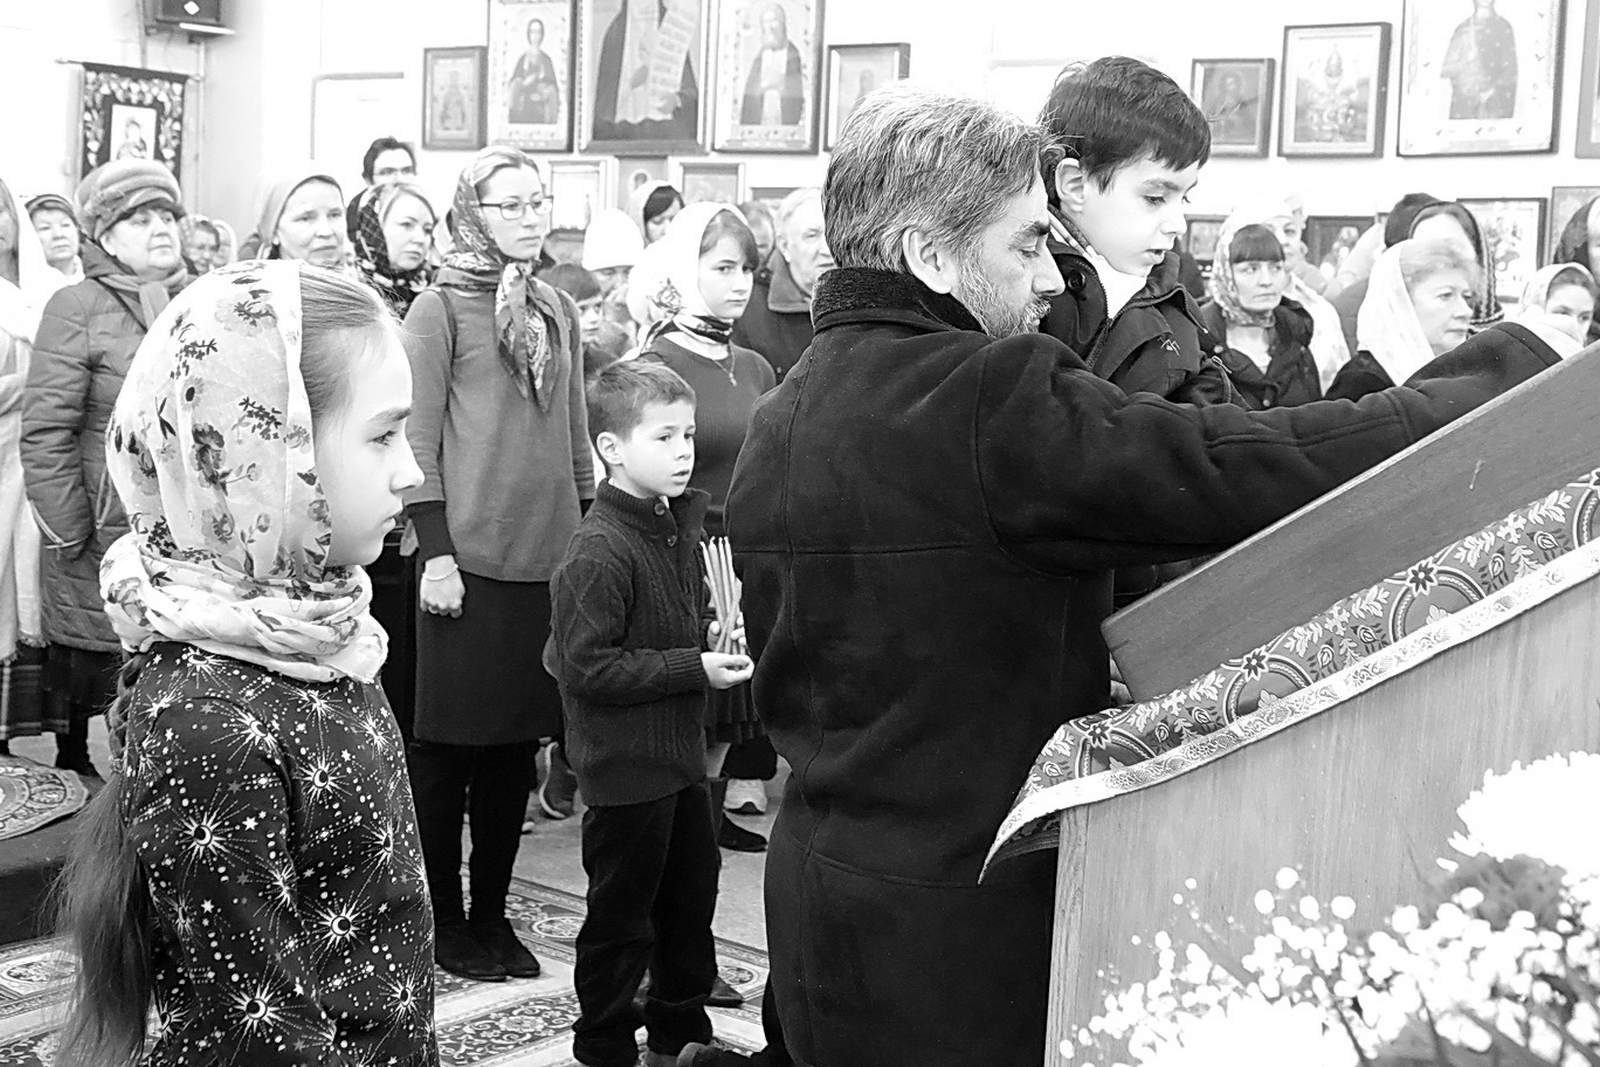 Prestol-prazdnik_10-Feb-2019_33